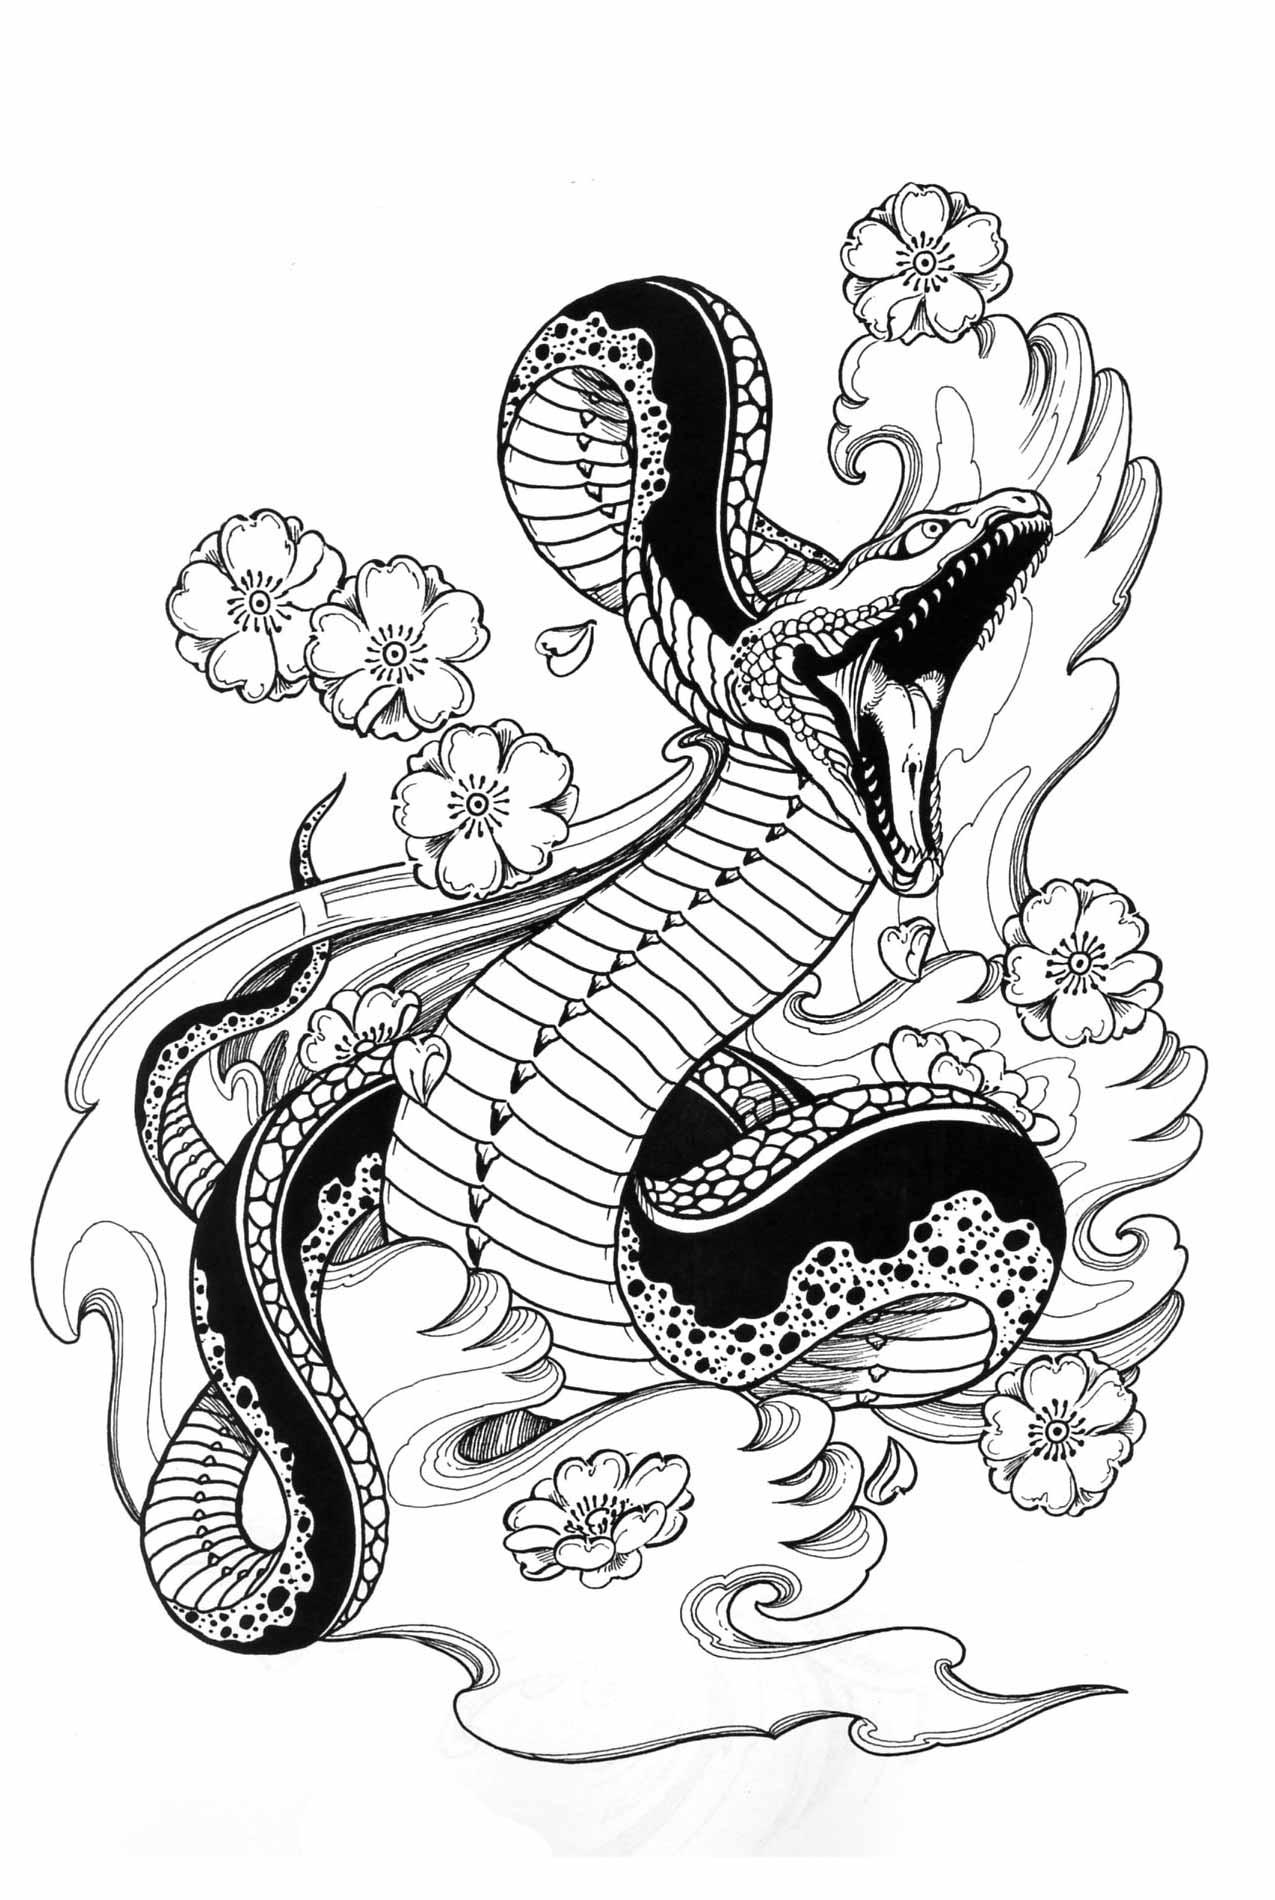 Japanese Snake Drawing at GetDrawings | Free download |Snake Tattoo Sketches